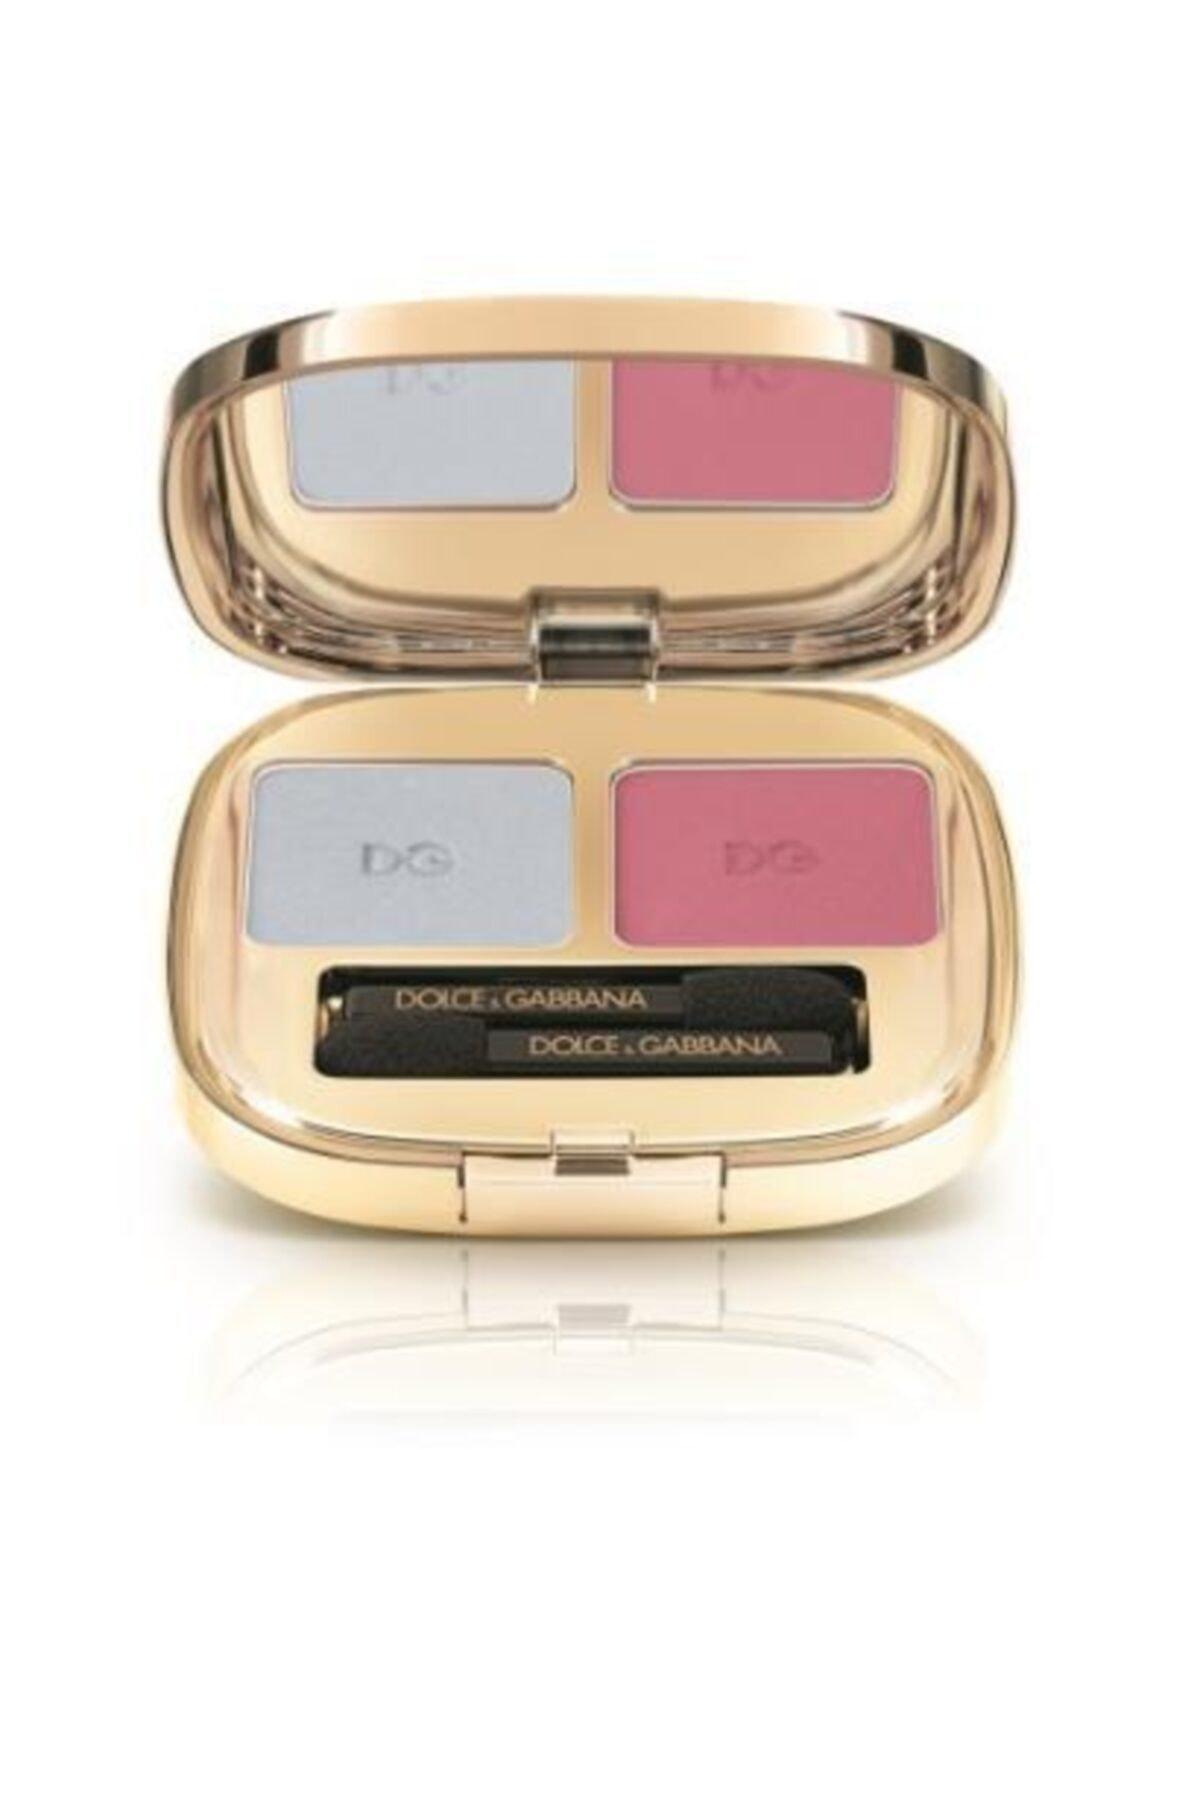 Dolce Gabbana Smooth Eye Colour Duo Göz Farı - 104 1